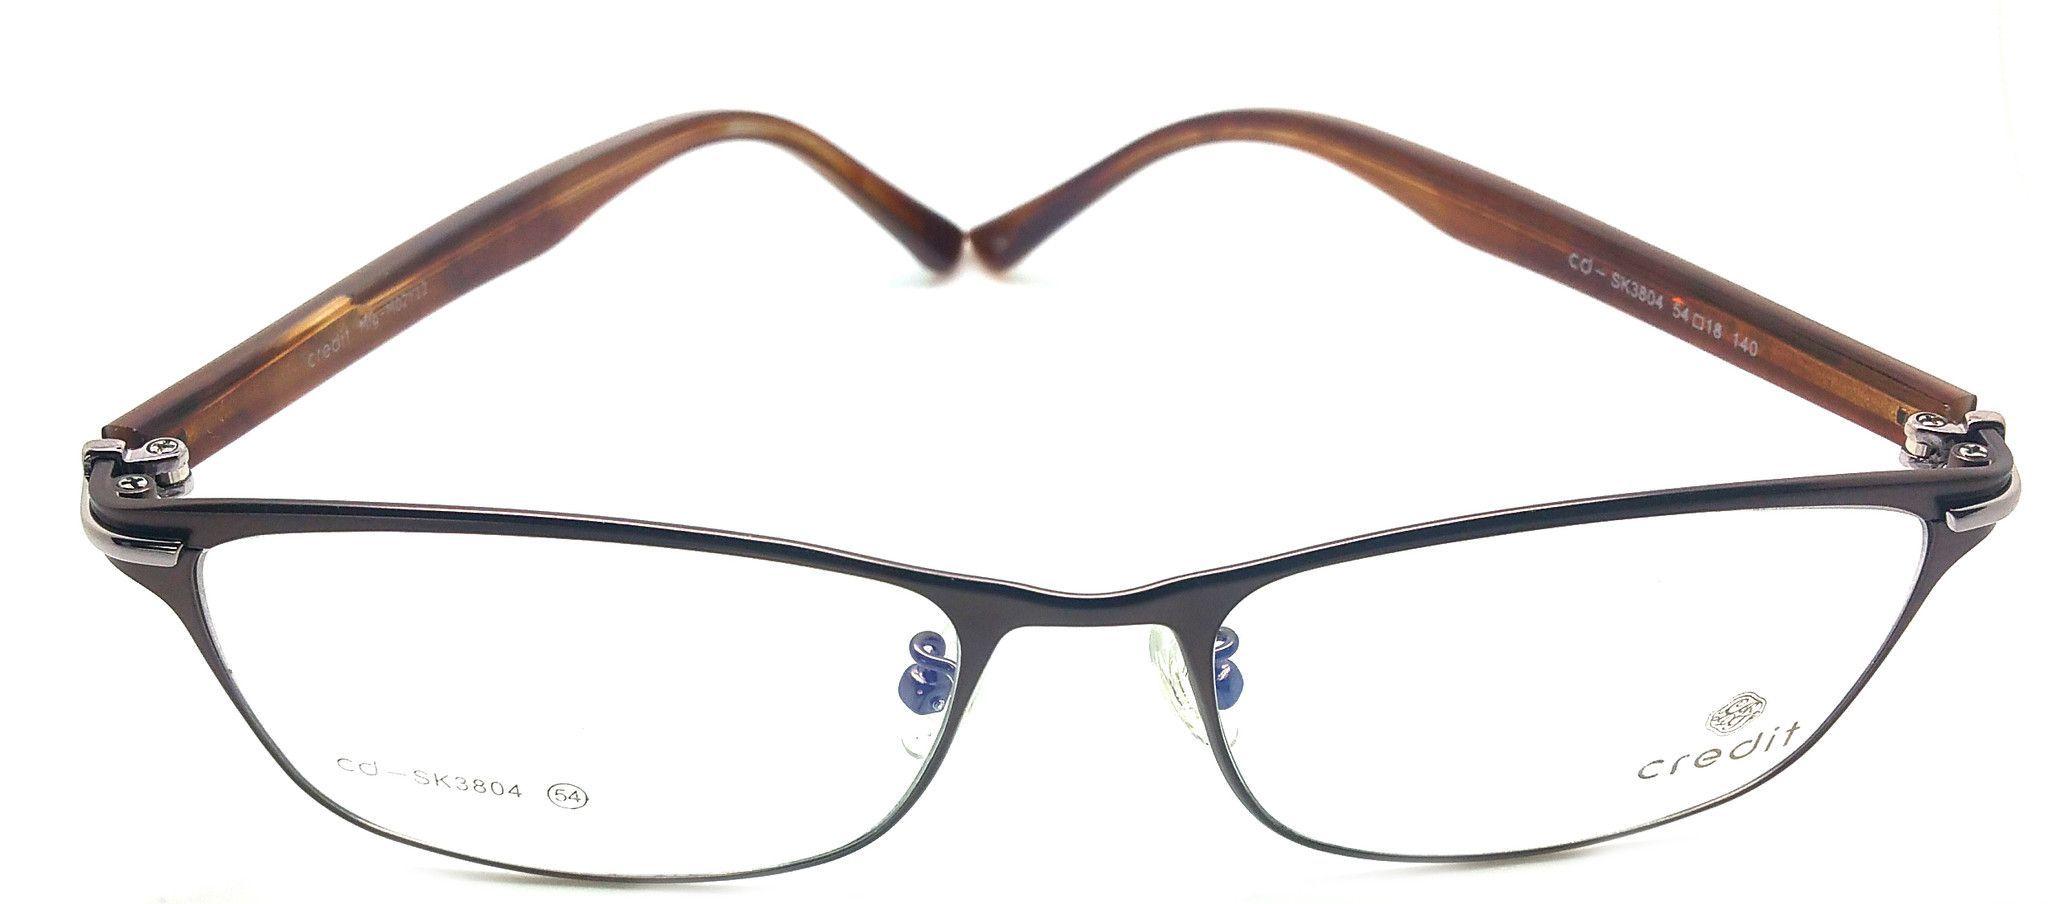 ff8635722990 Credit Prescription Eye Glasses Frame